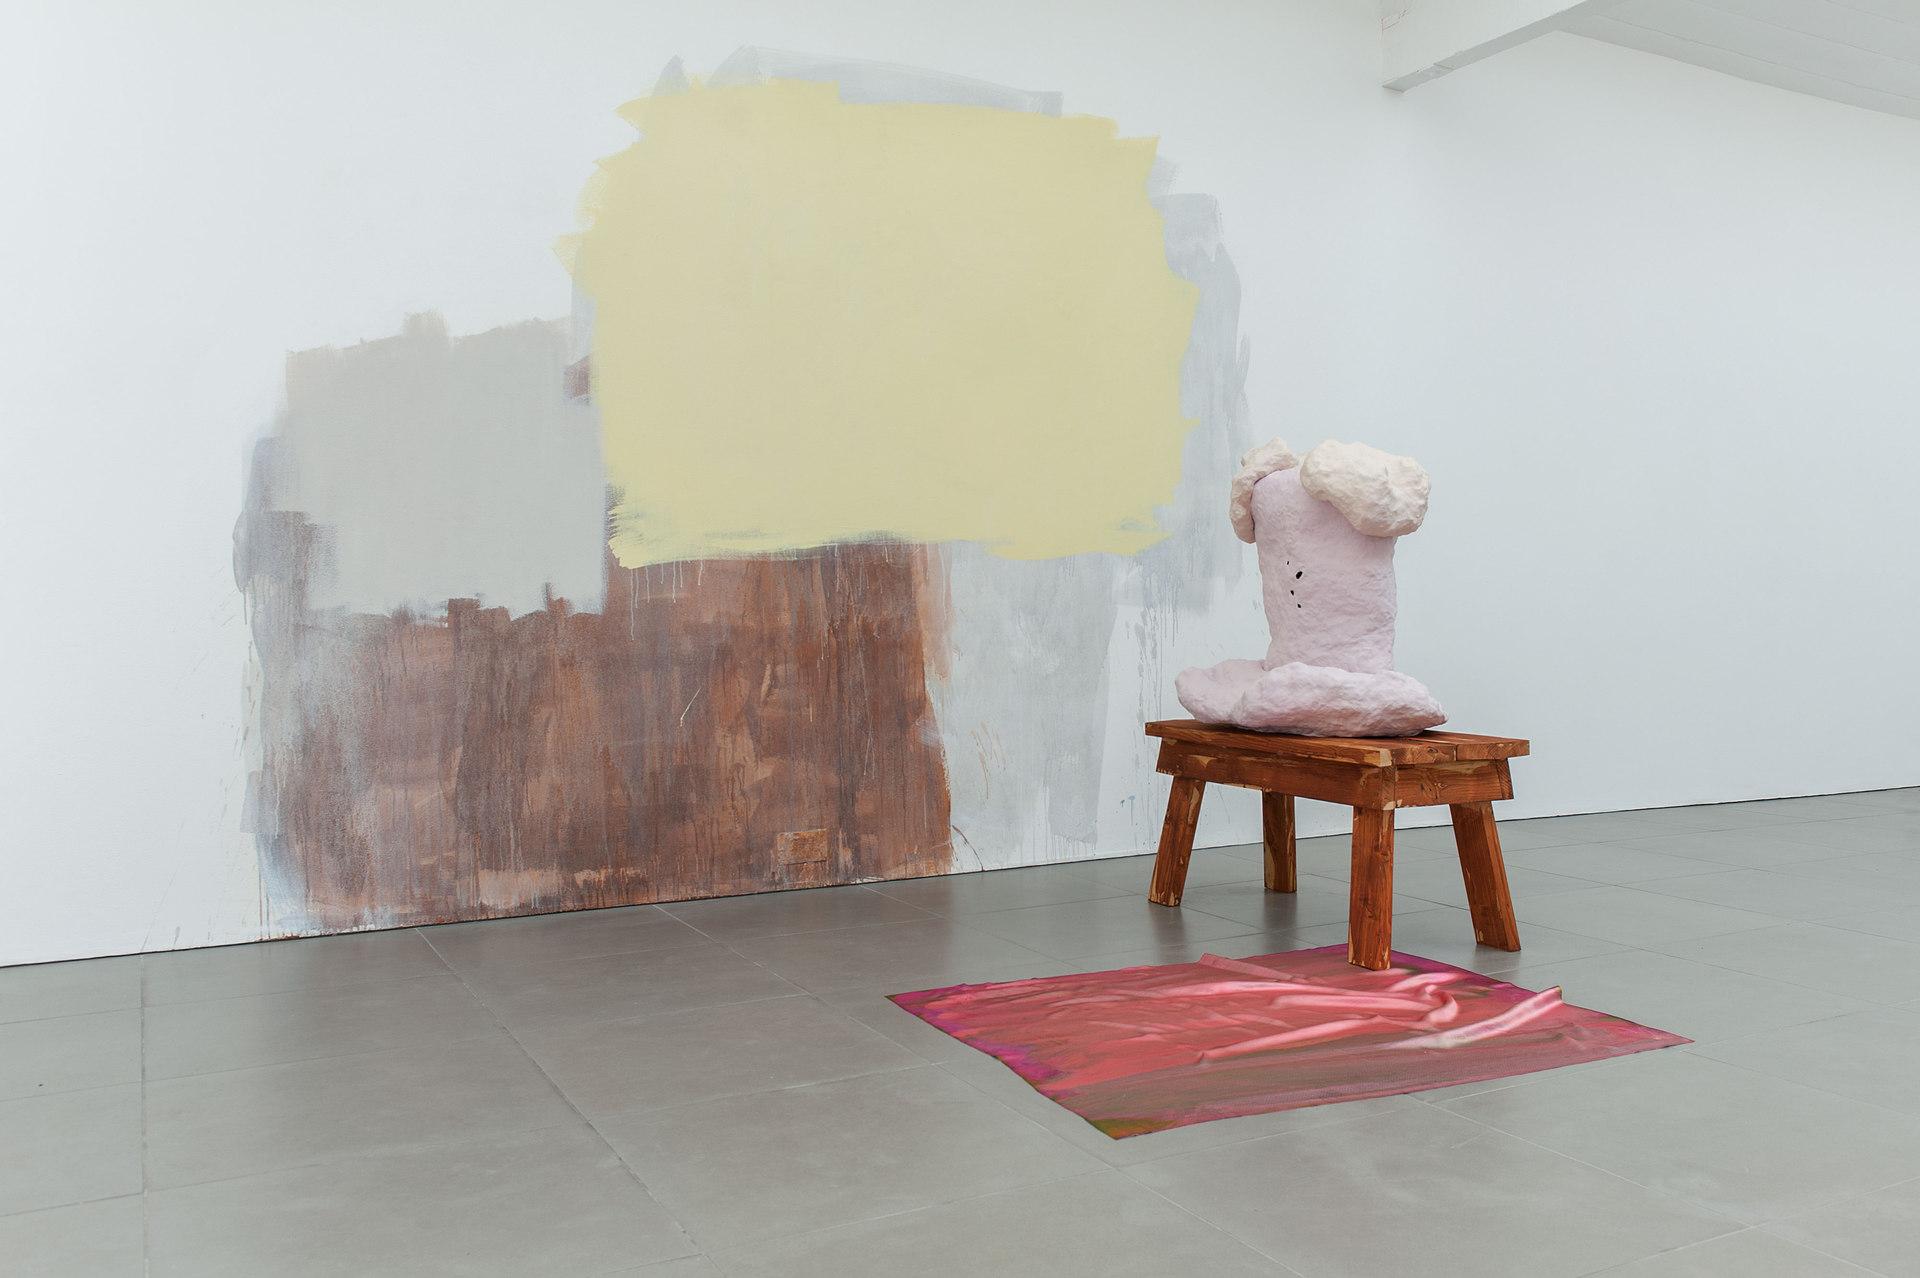 Exhibition, 2014, Celia Hempton, digital print on silk satin, 60 x 72 cm, acrylic paint on wall, Katie Cuddon, painted ceramic, painted wood, 100 x 123 x 54 cm, Cell Project Space